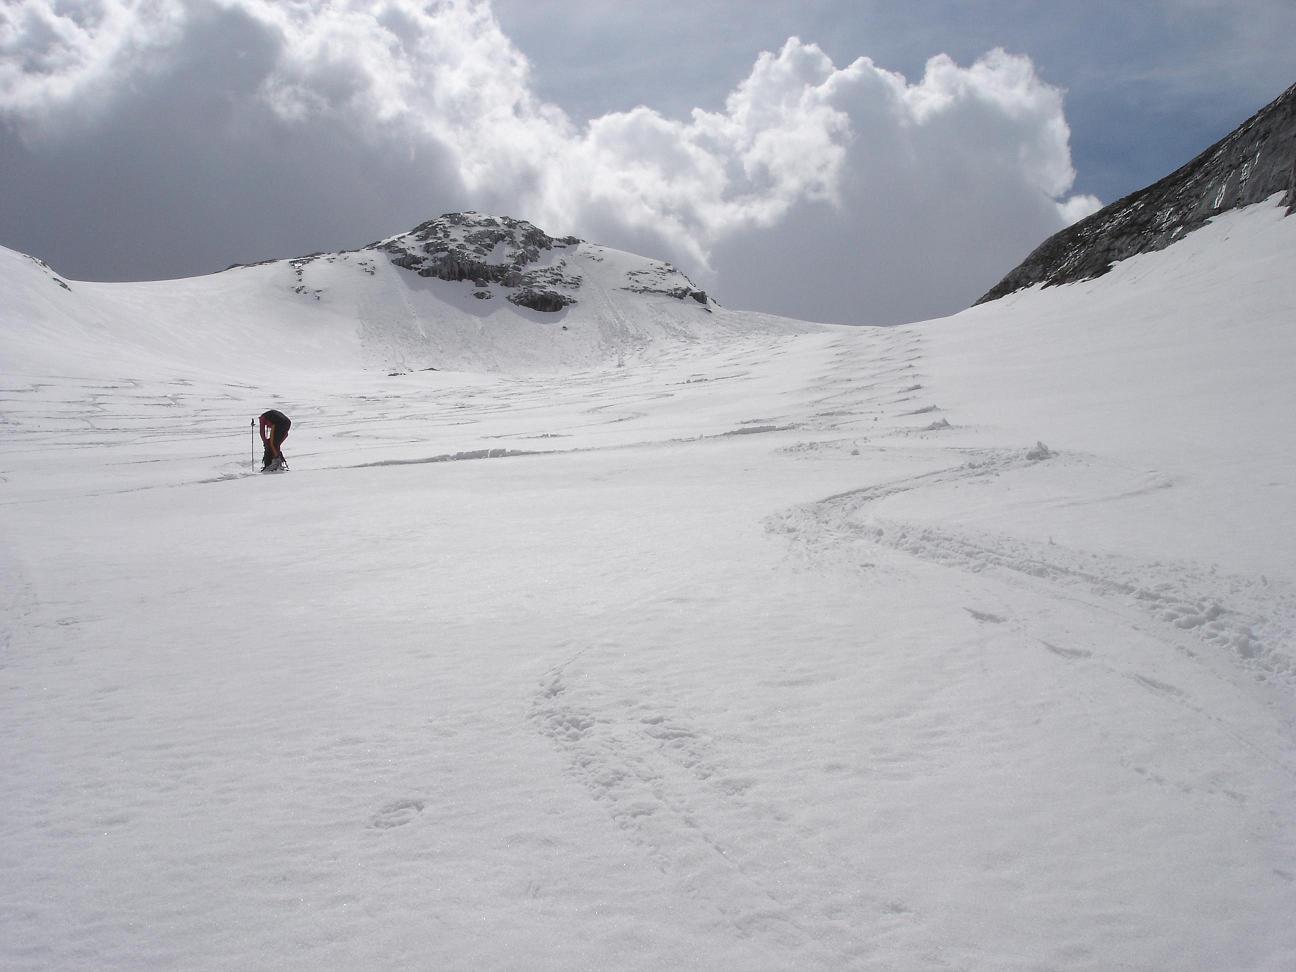 Foto: Sebastian Stoib / Ski Tour / Brandhorn (2610m) / bester Firn am 1.Mai bei der Abfahrt im Tauchertal / 04.01.2007 20:19:02